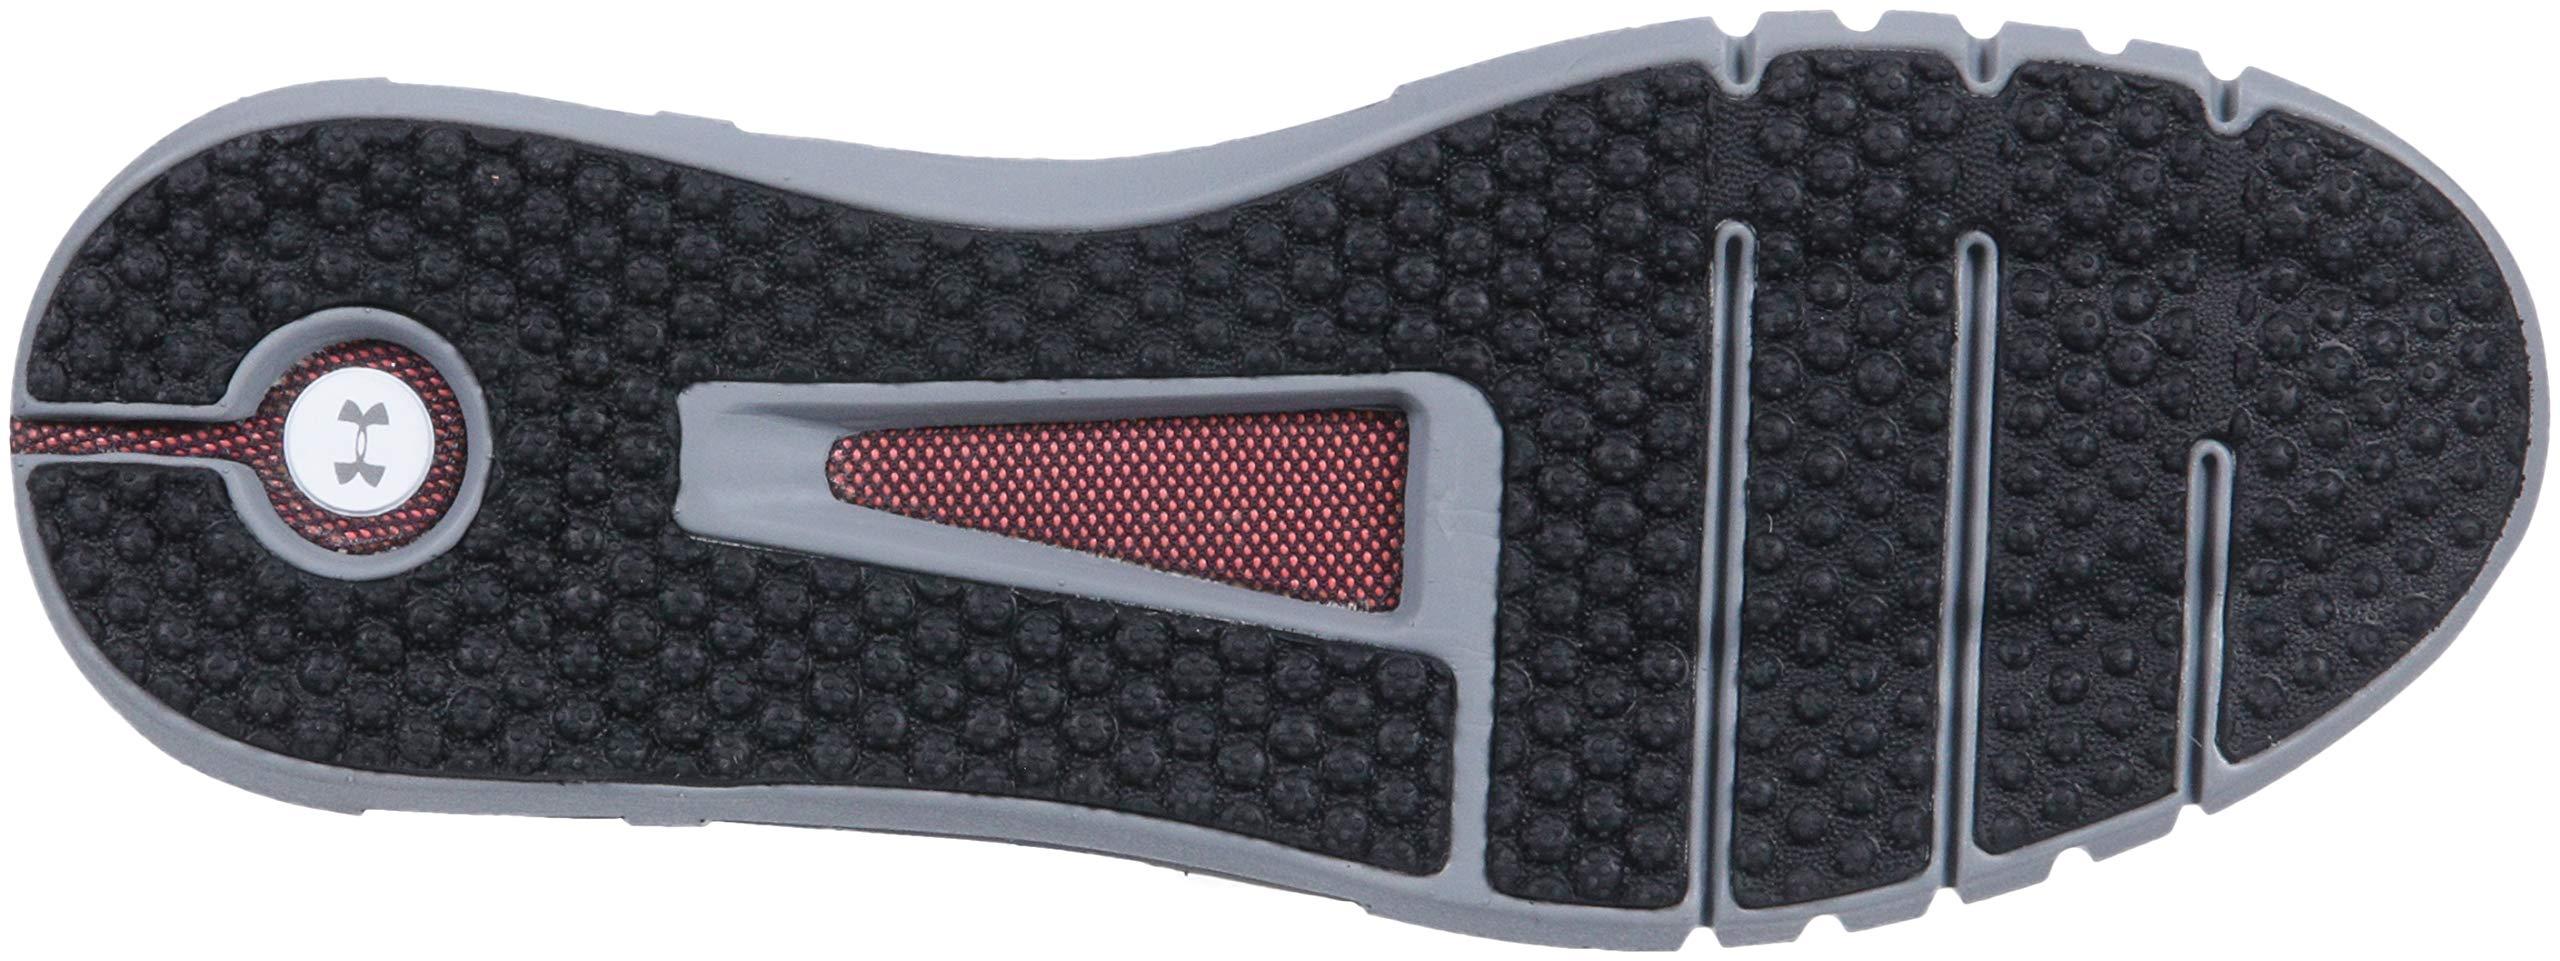 adidas Men's Questar BYD Running Shoe Black/Grey, 6.5 M US by adidas (Image #3)